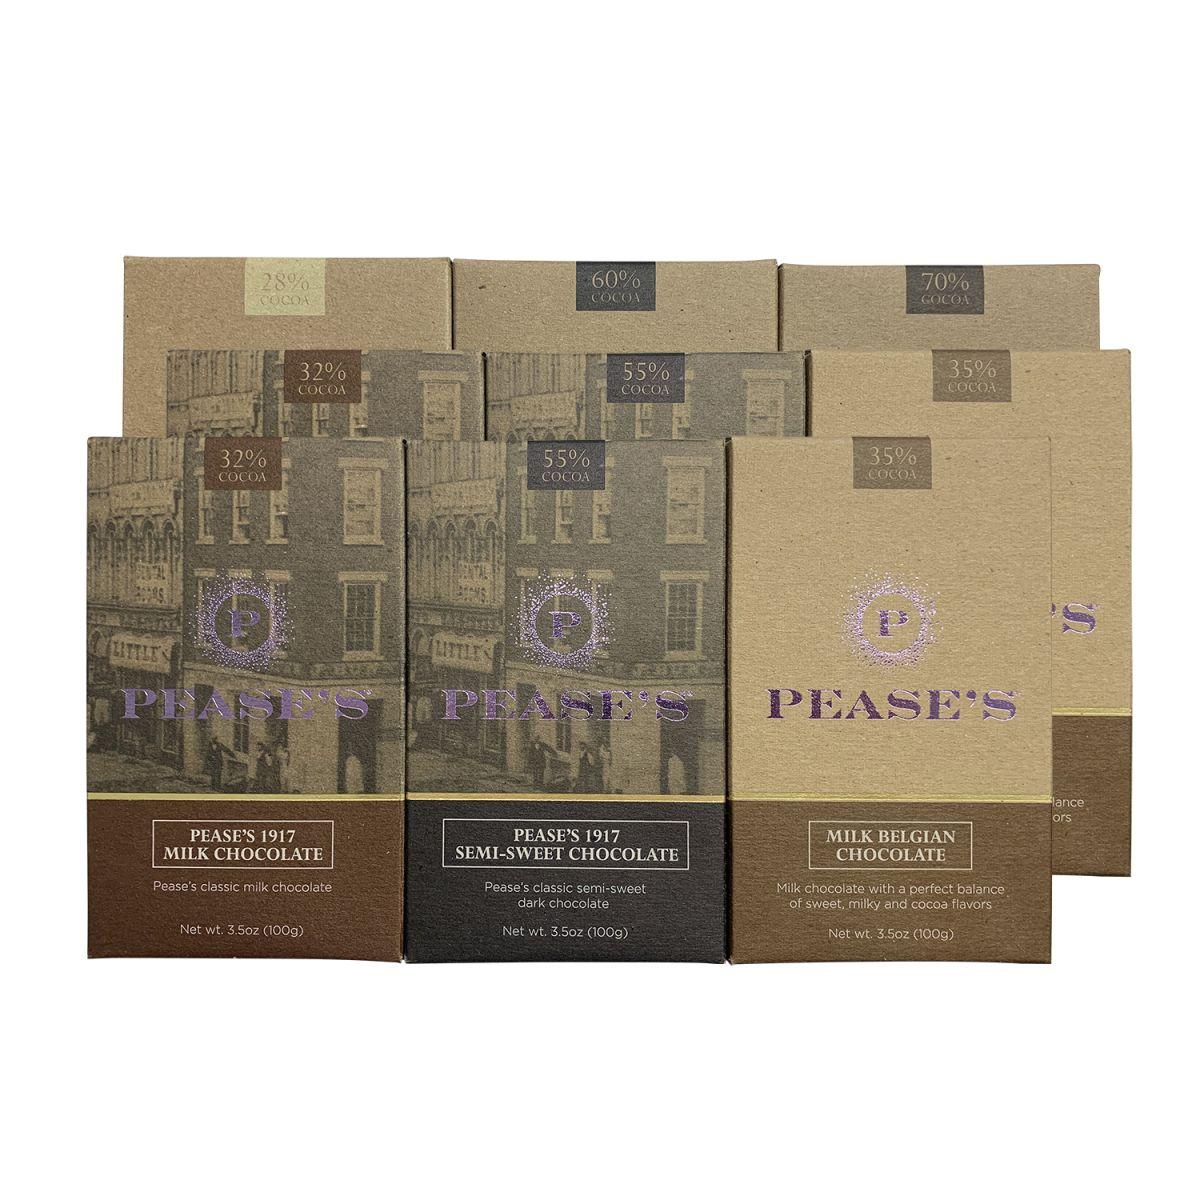 Pease's Milk/Dark/Belgian Chocolate Bars - Variety 9PK